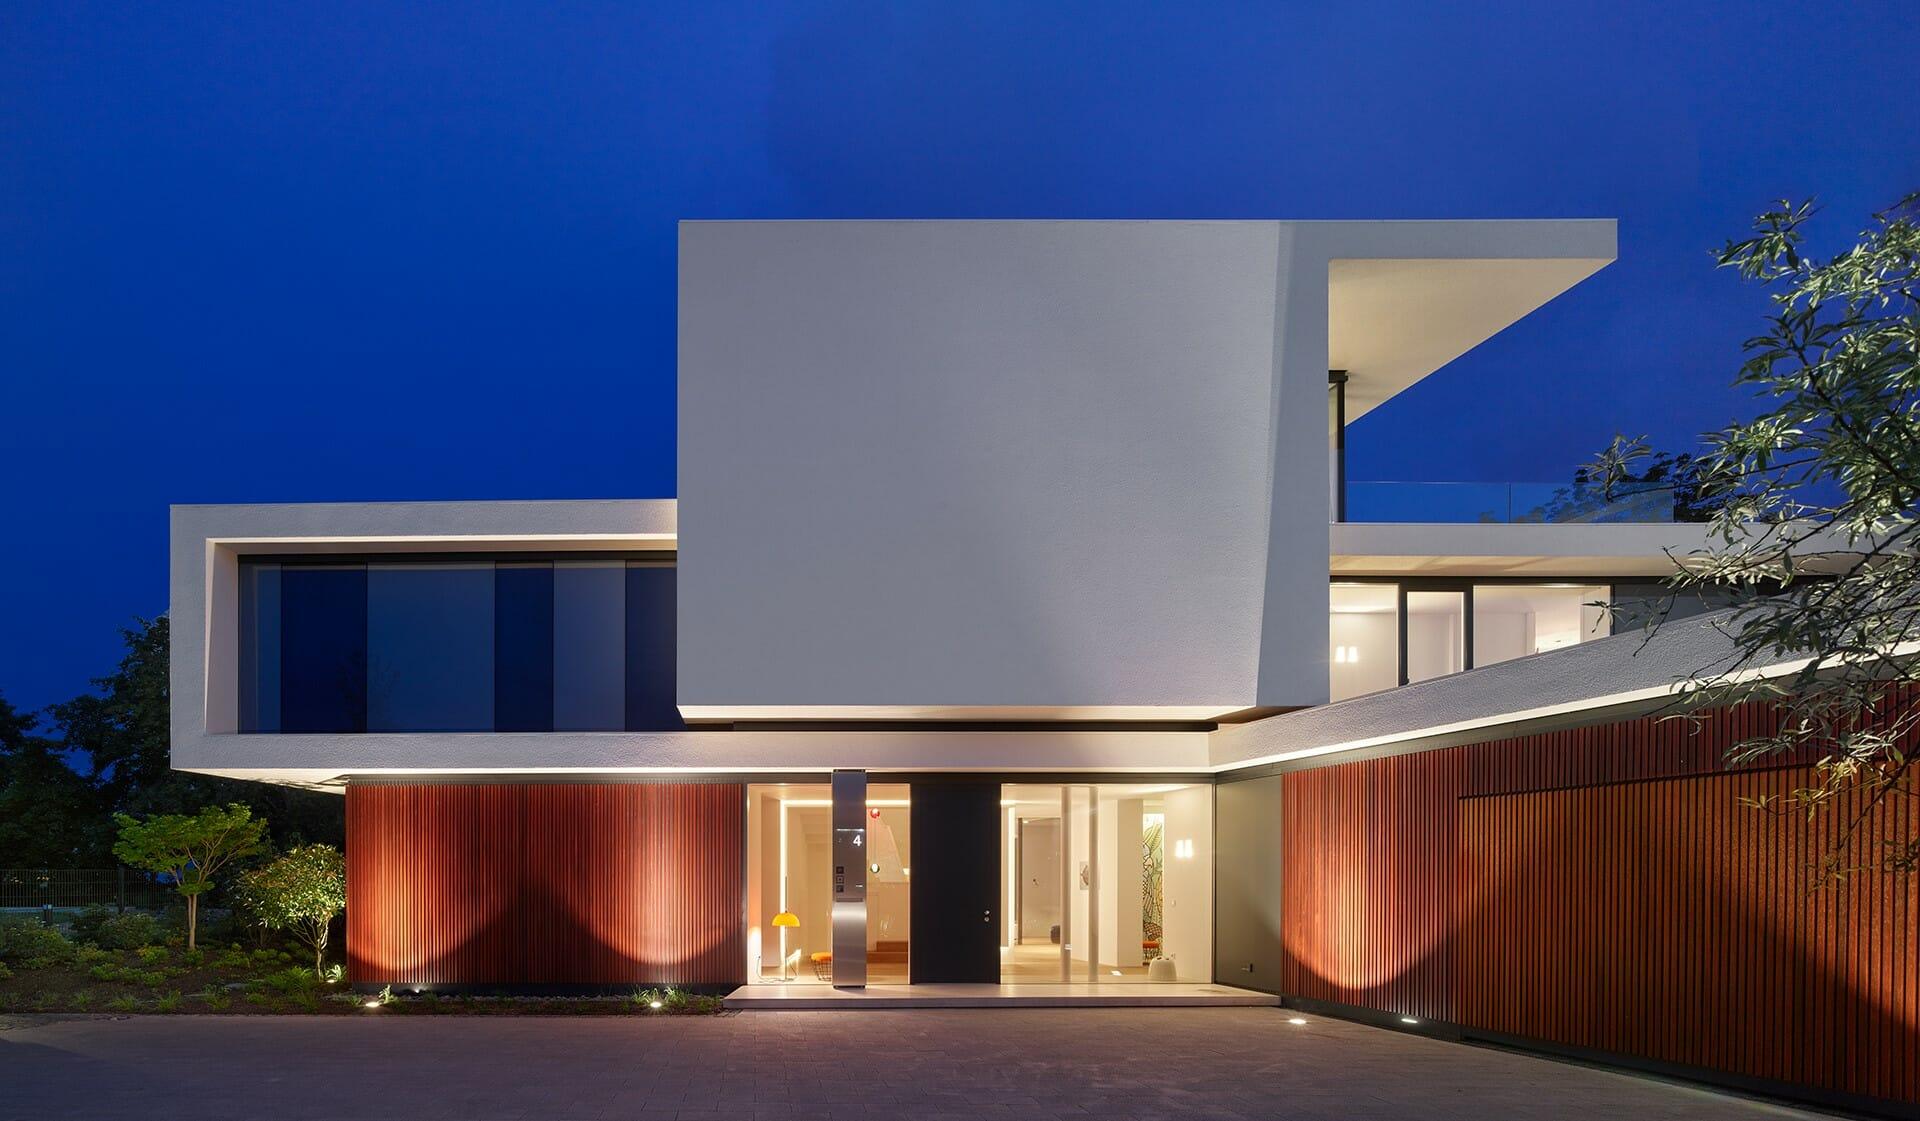 Villa in Saarbruecken Weber Hummel Architekten 10